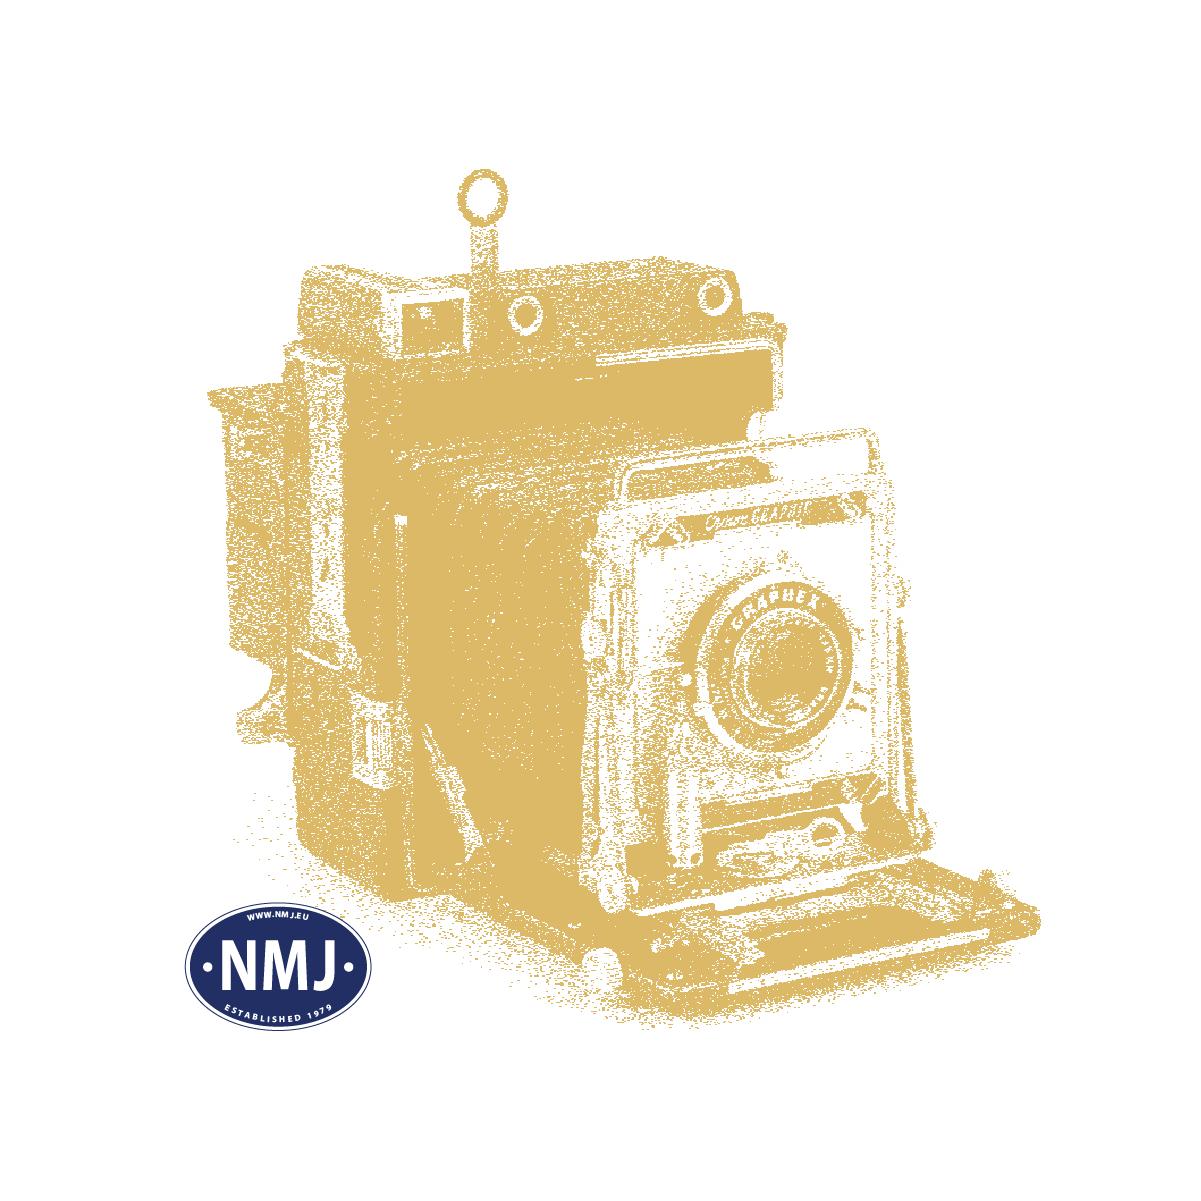 NMJT106.501 - NMJ Topline Personenwagen B3-6.25651 der NSB, rot/grau/silber